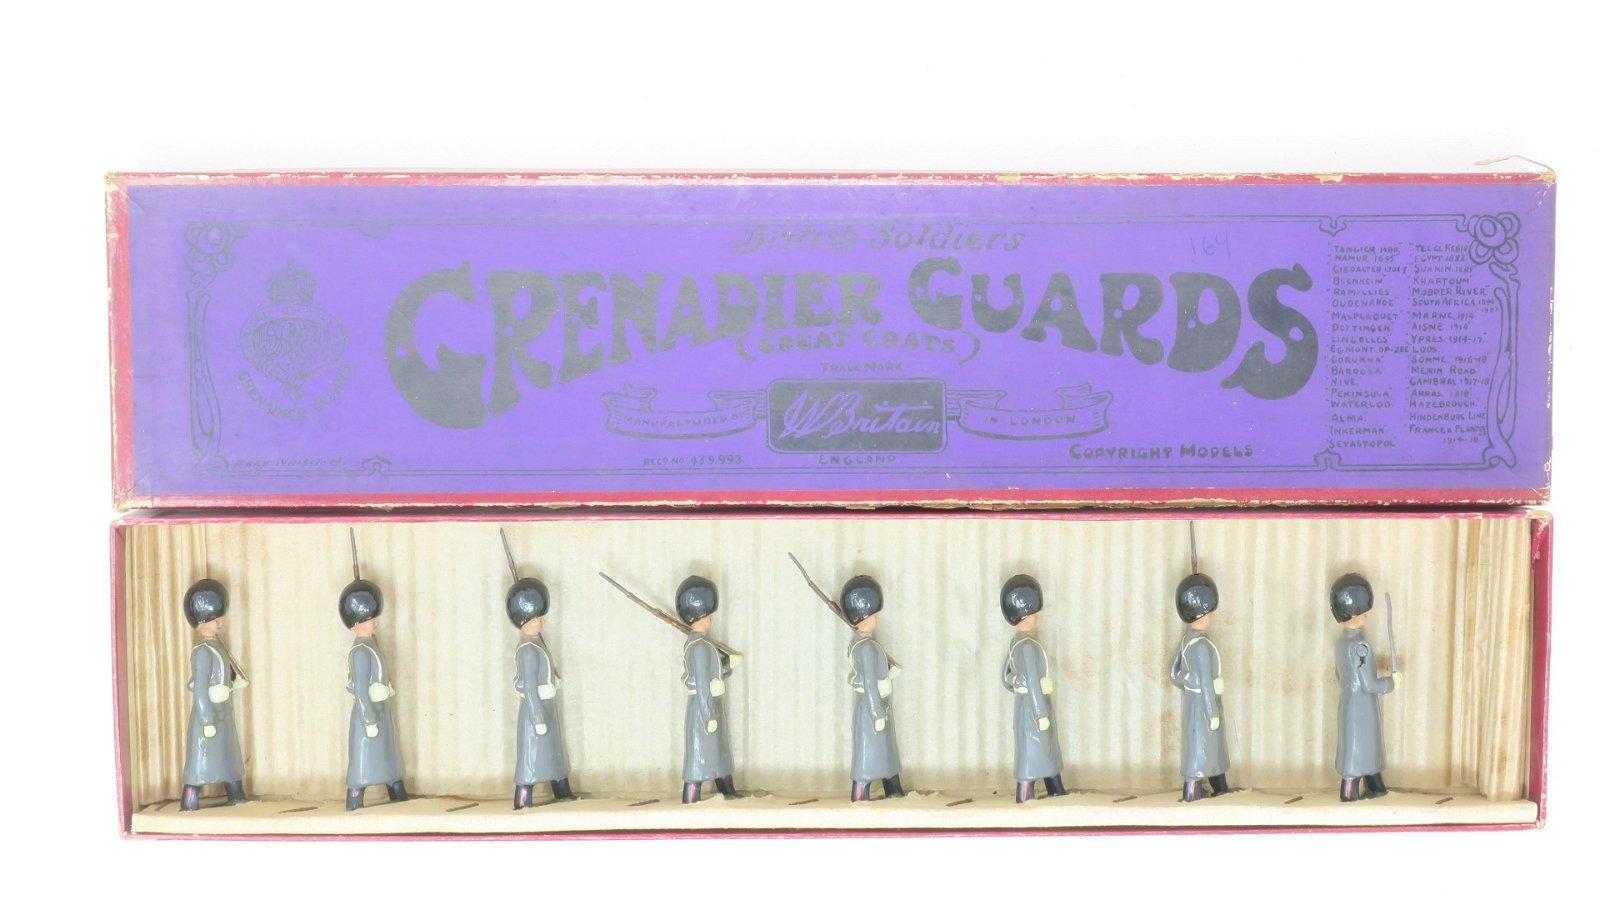 Britain's set #312 Grenadier Guards